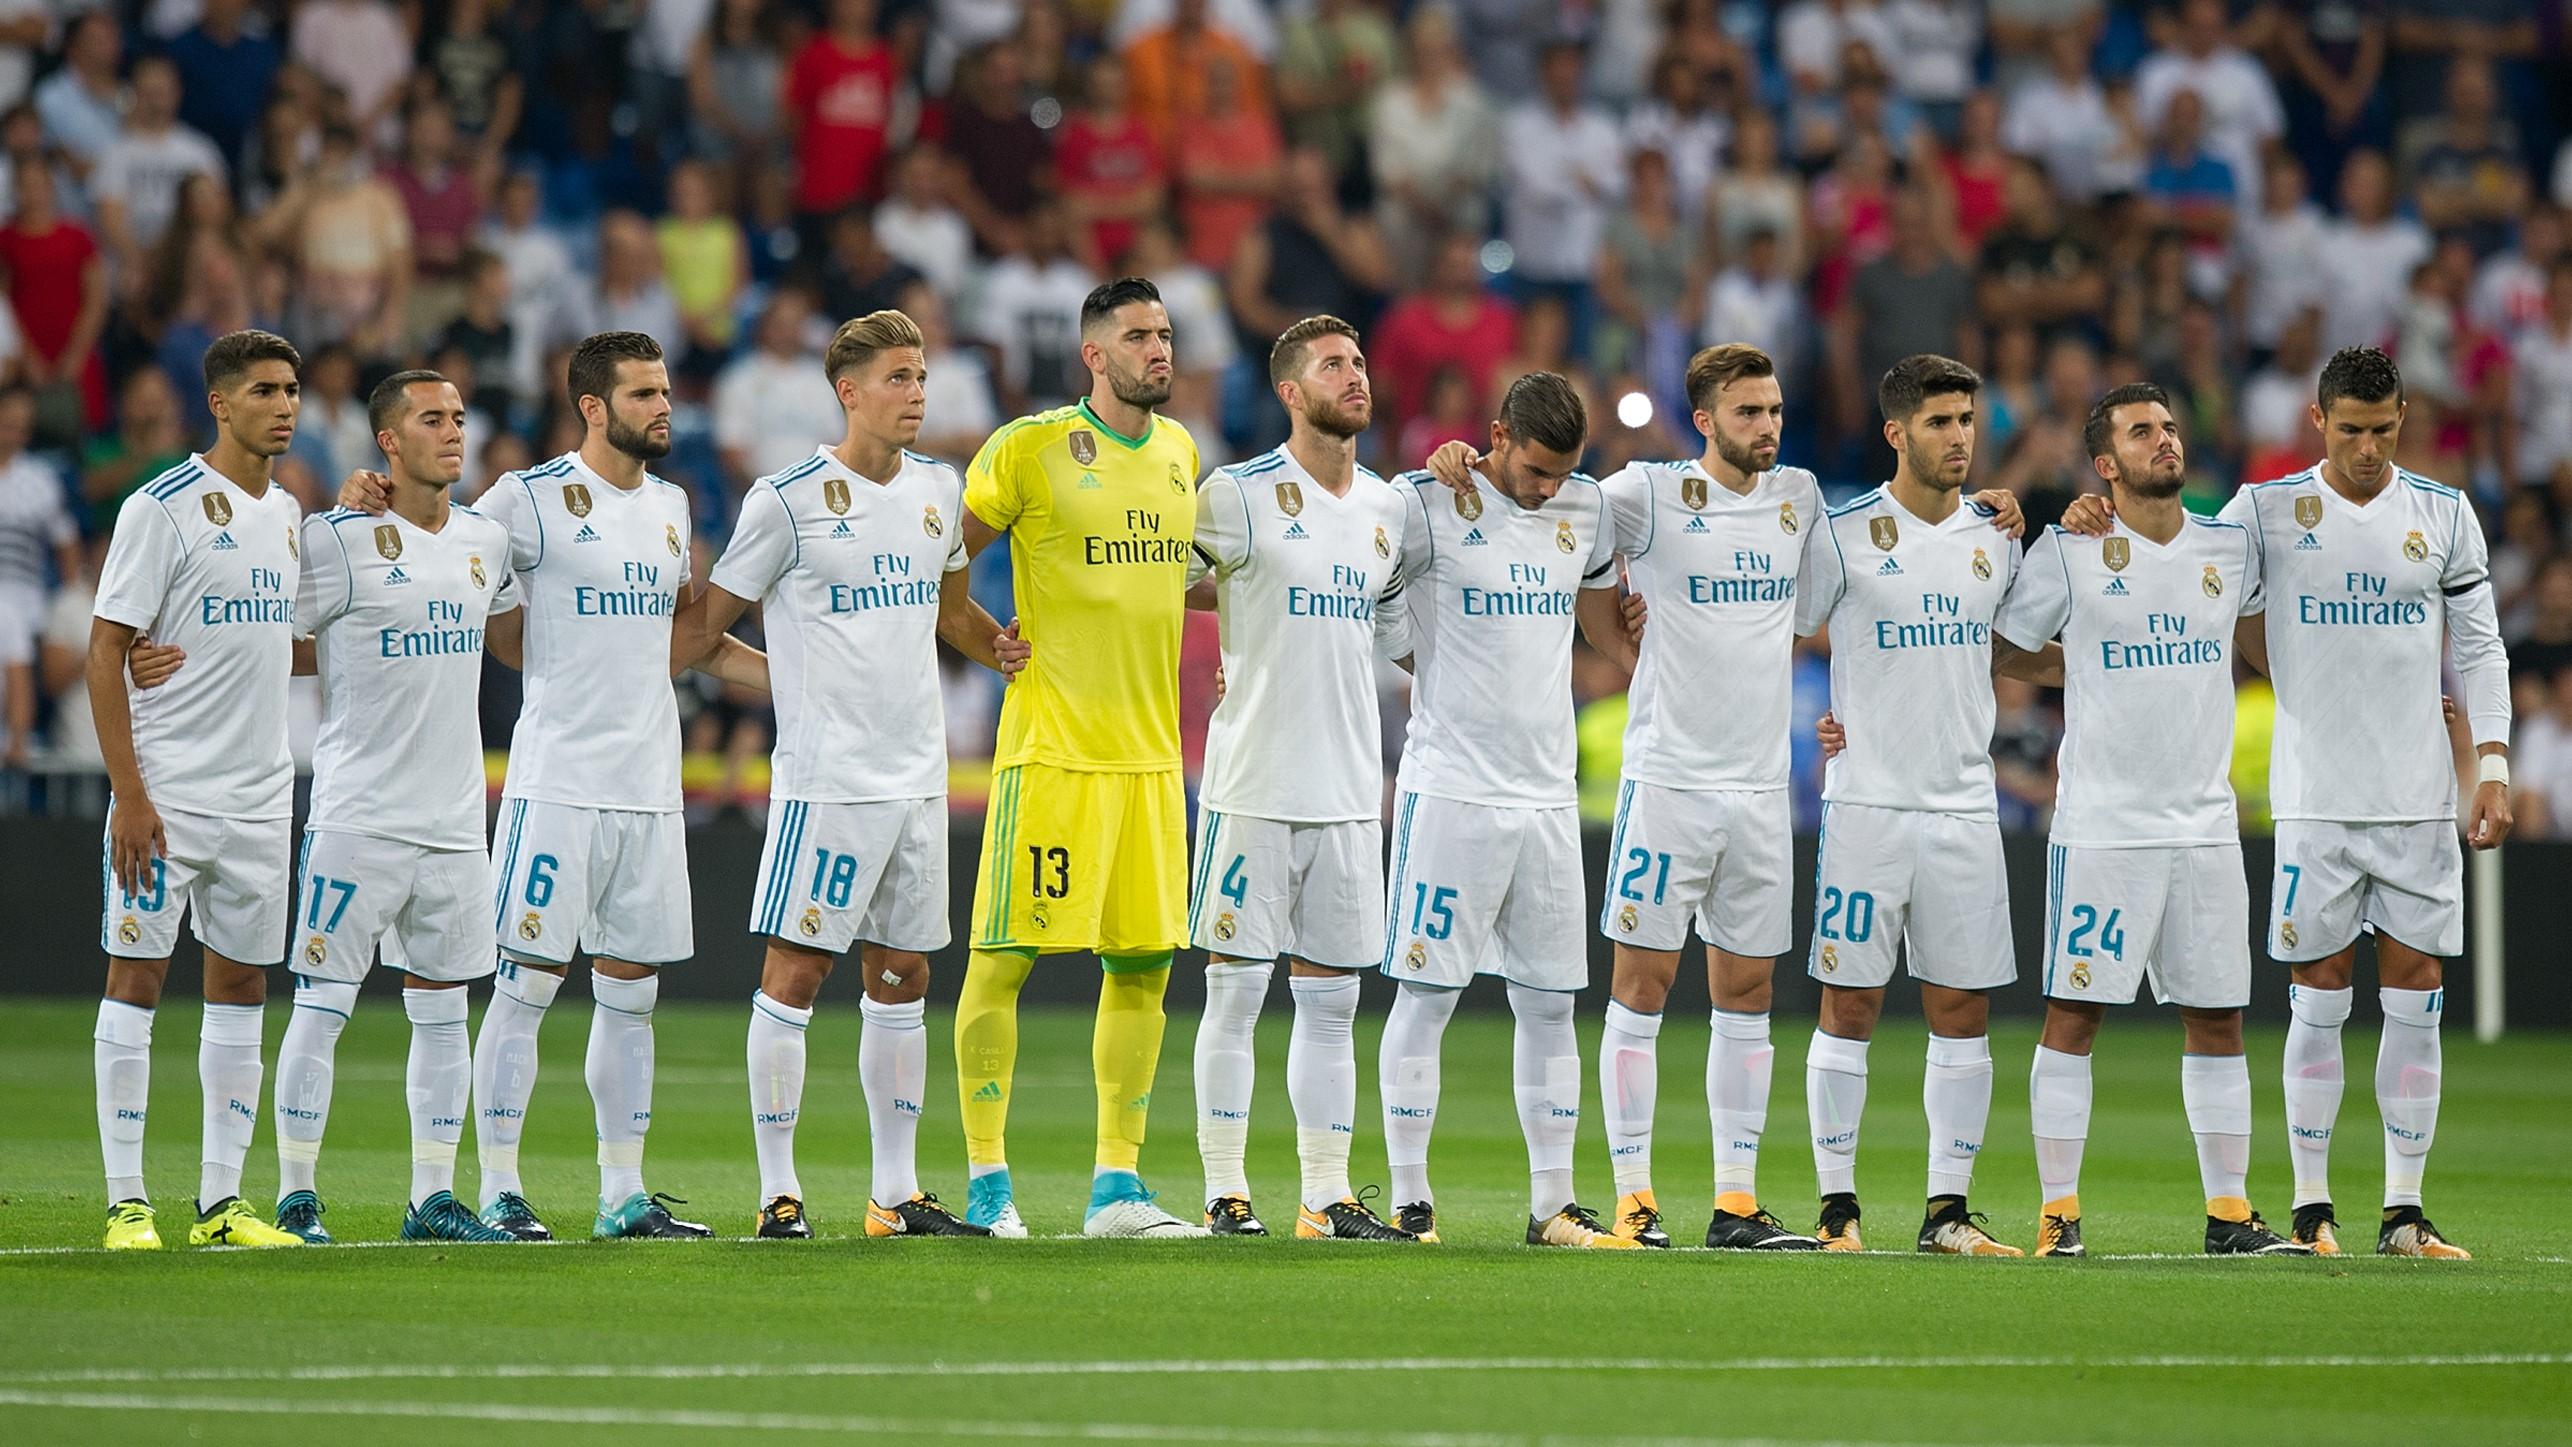 Real Madrid Trofeo Santiago Bernabeu 23082017